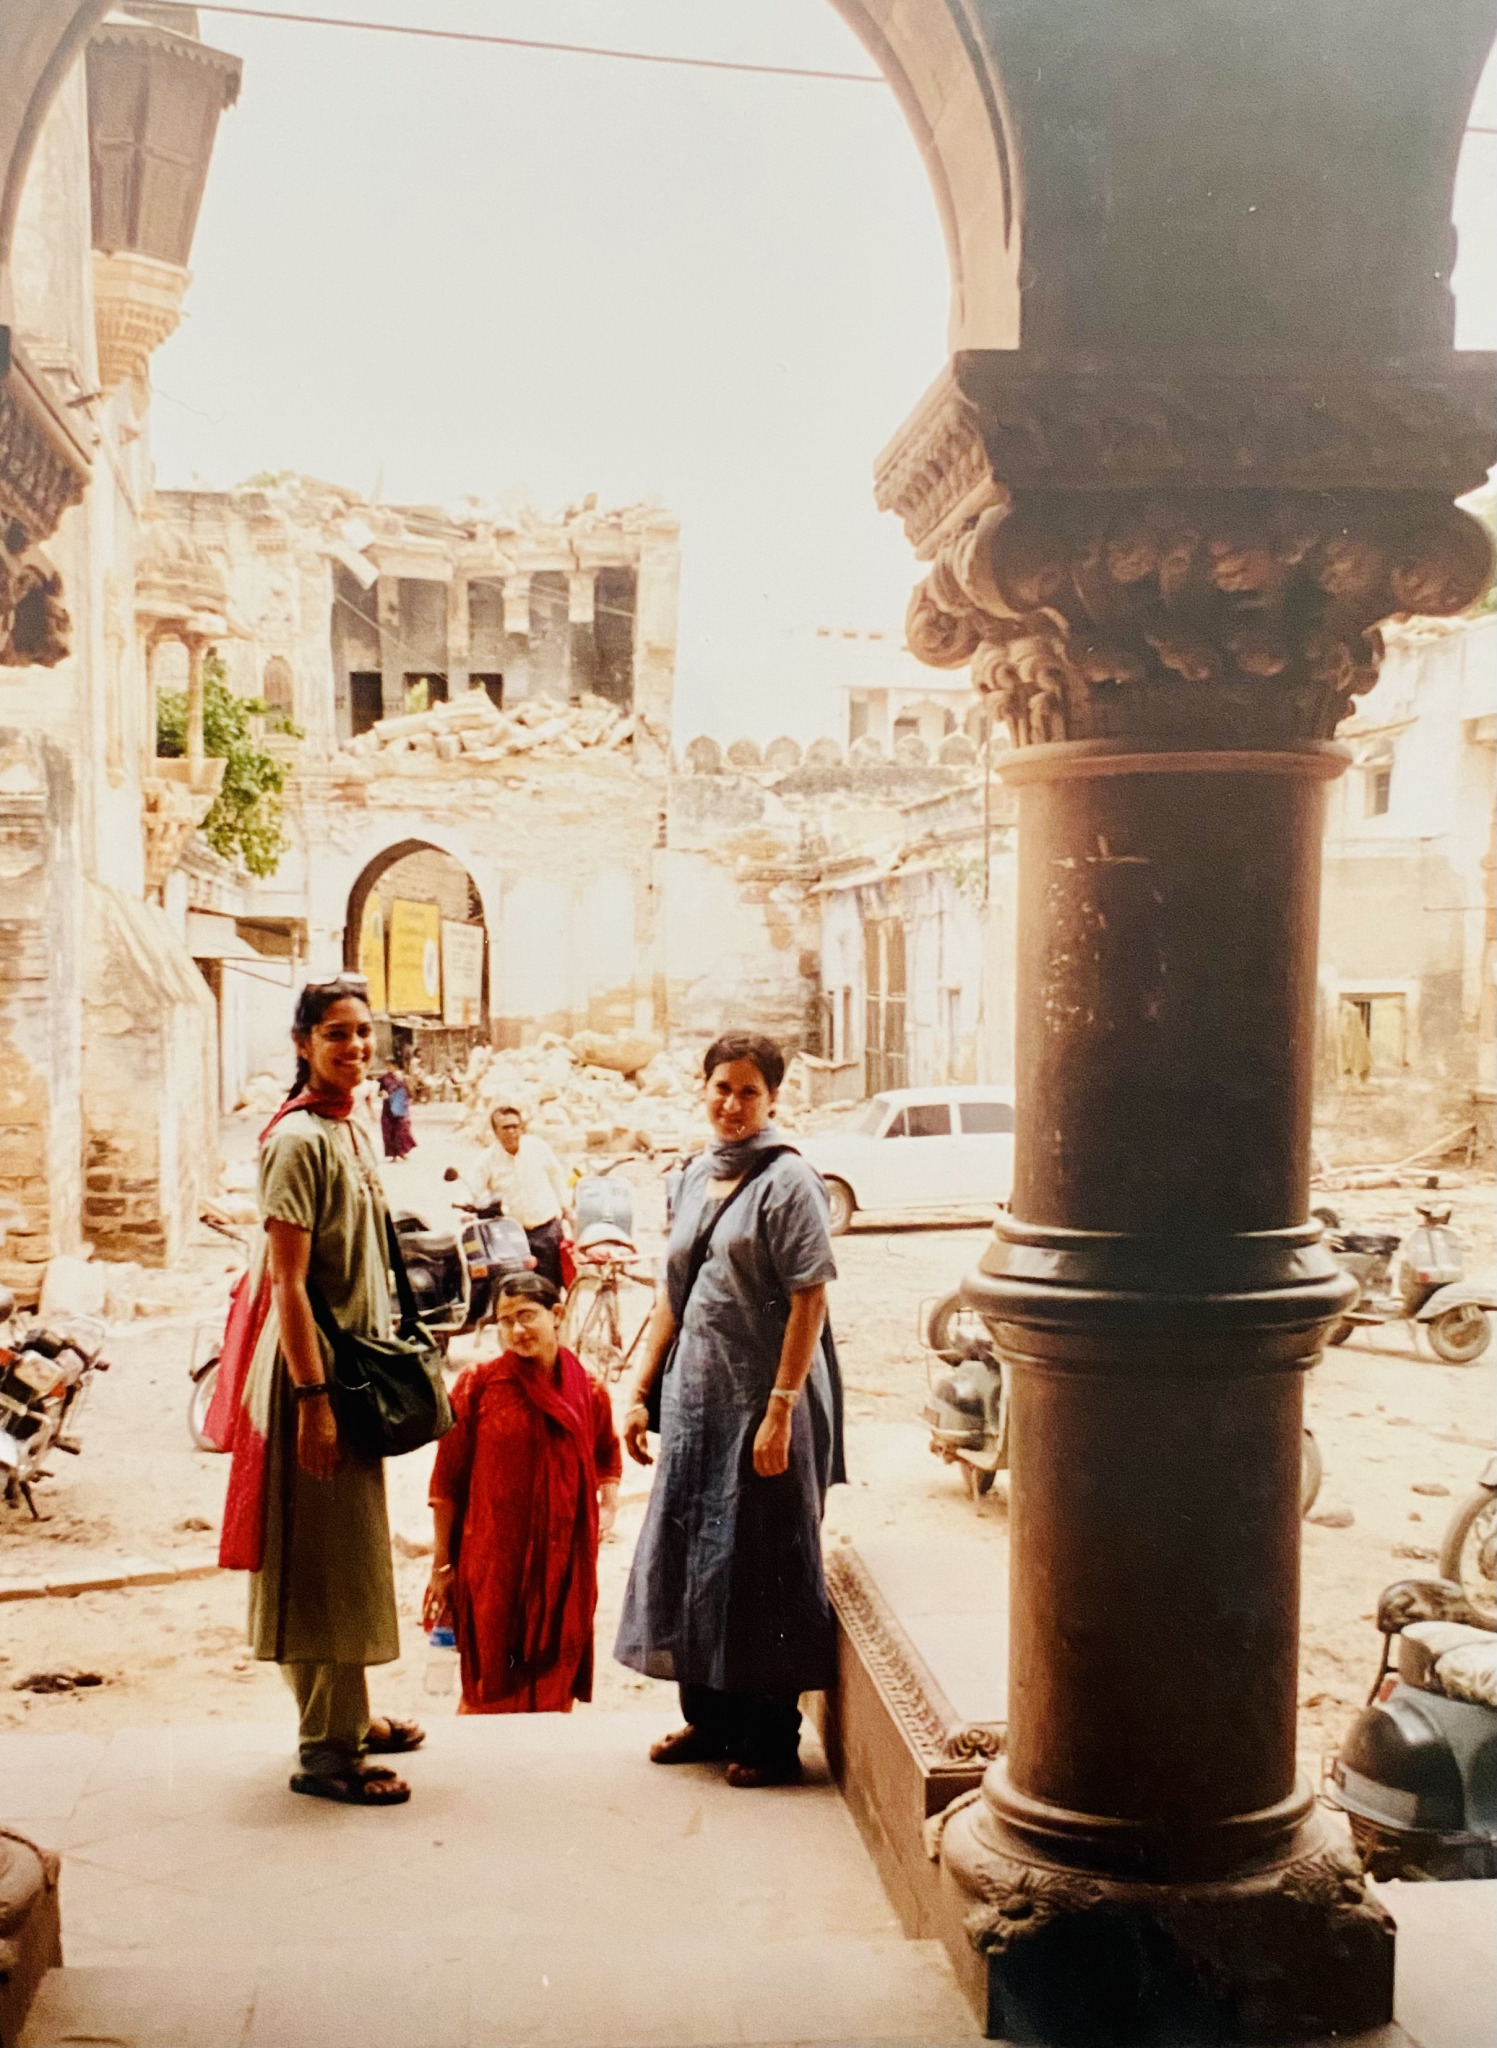 Meenakshi, Shruti and Tanvi standing in front of the ruins of buildings.